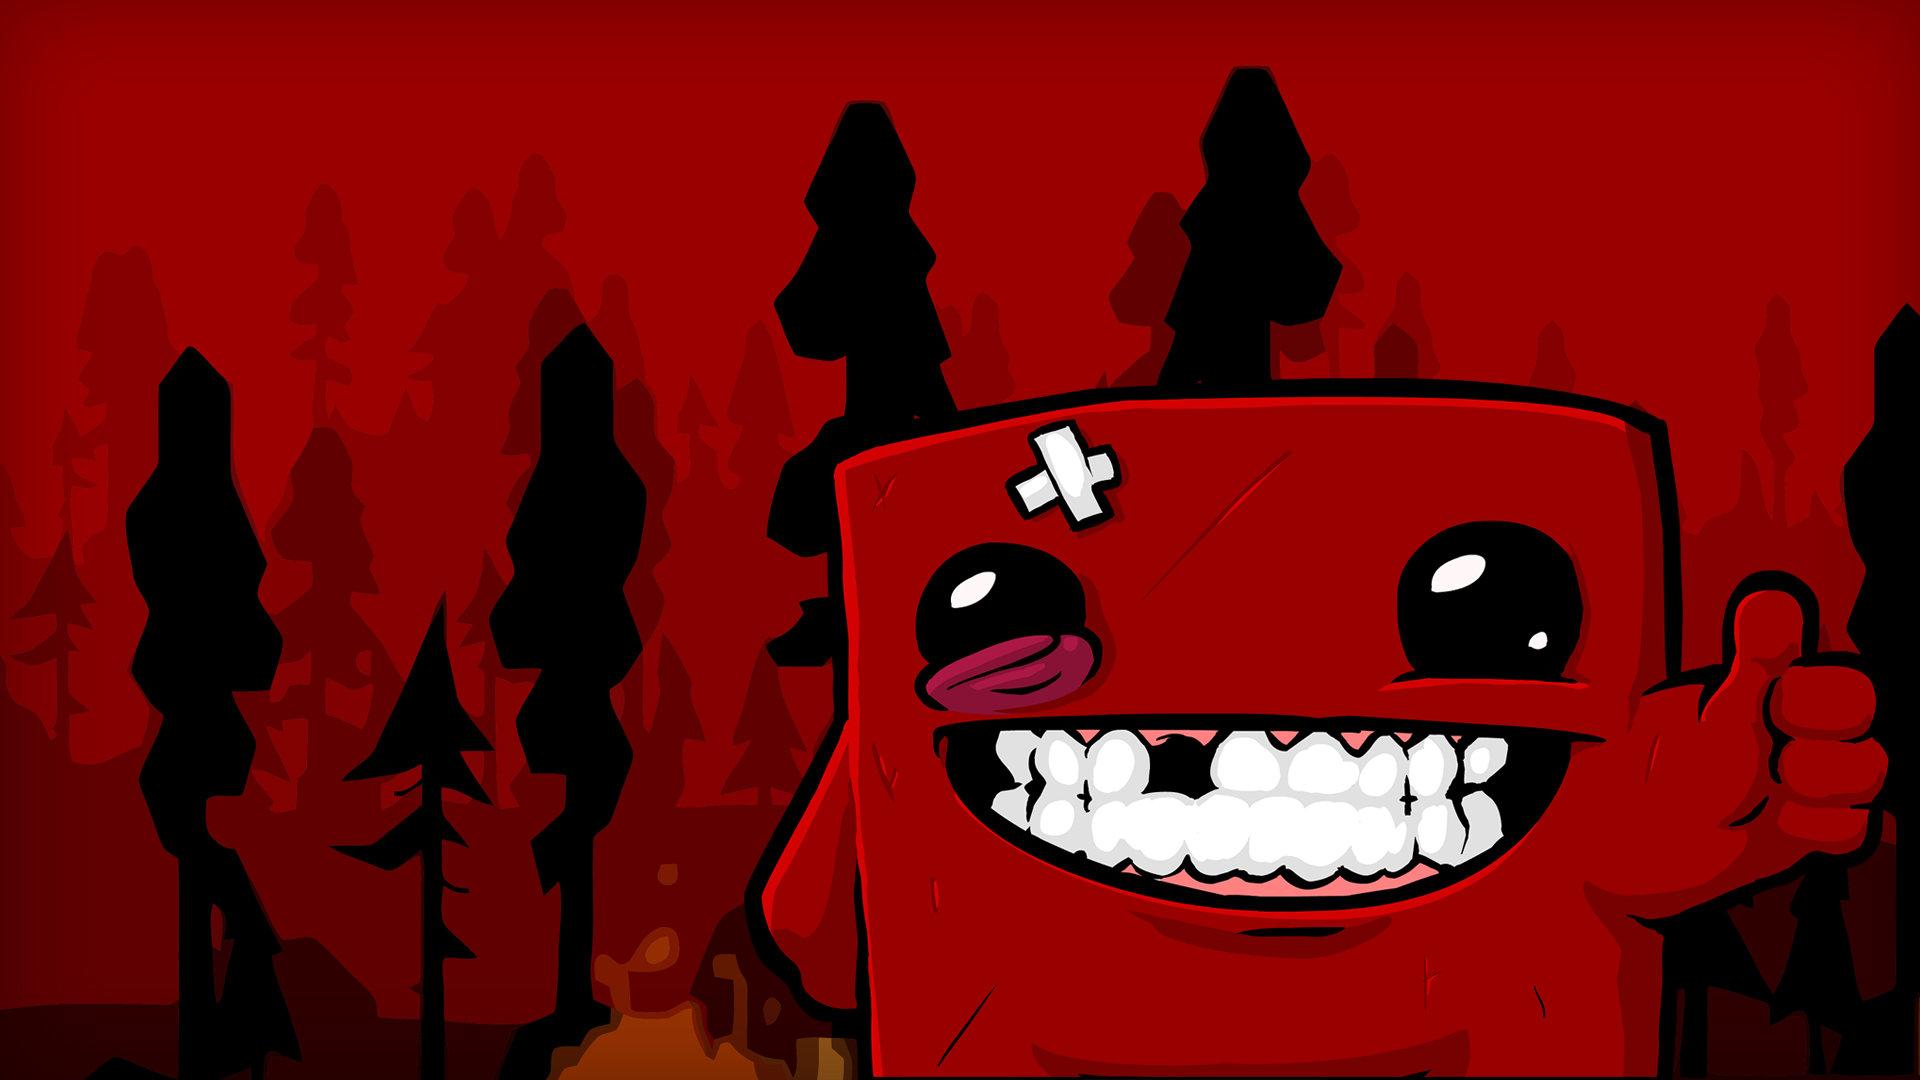 Super Meat Boy Free Download Pc